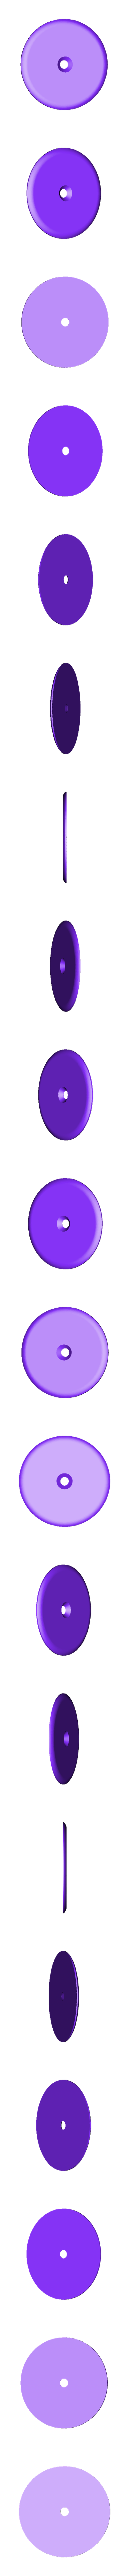 3.1.stl Download free STL file Solder feeder • 3D printable design, Ruvimkub